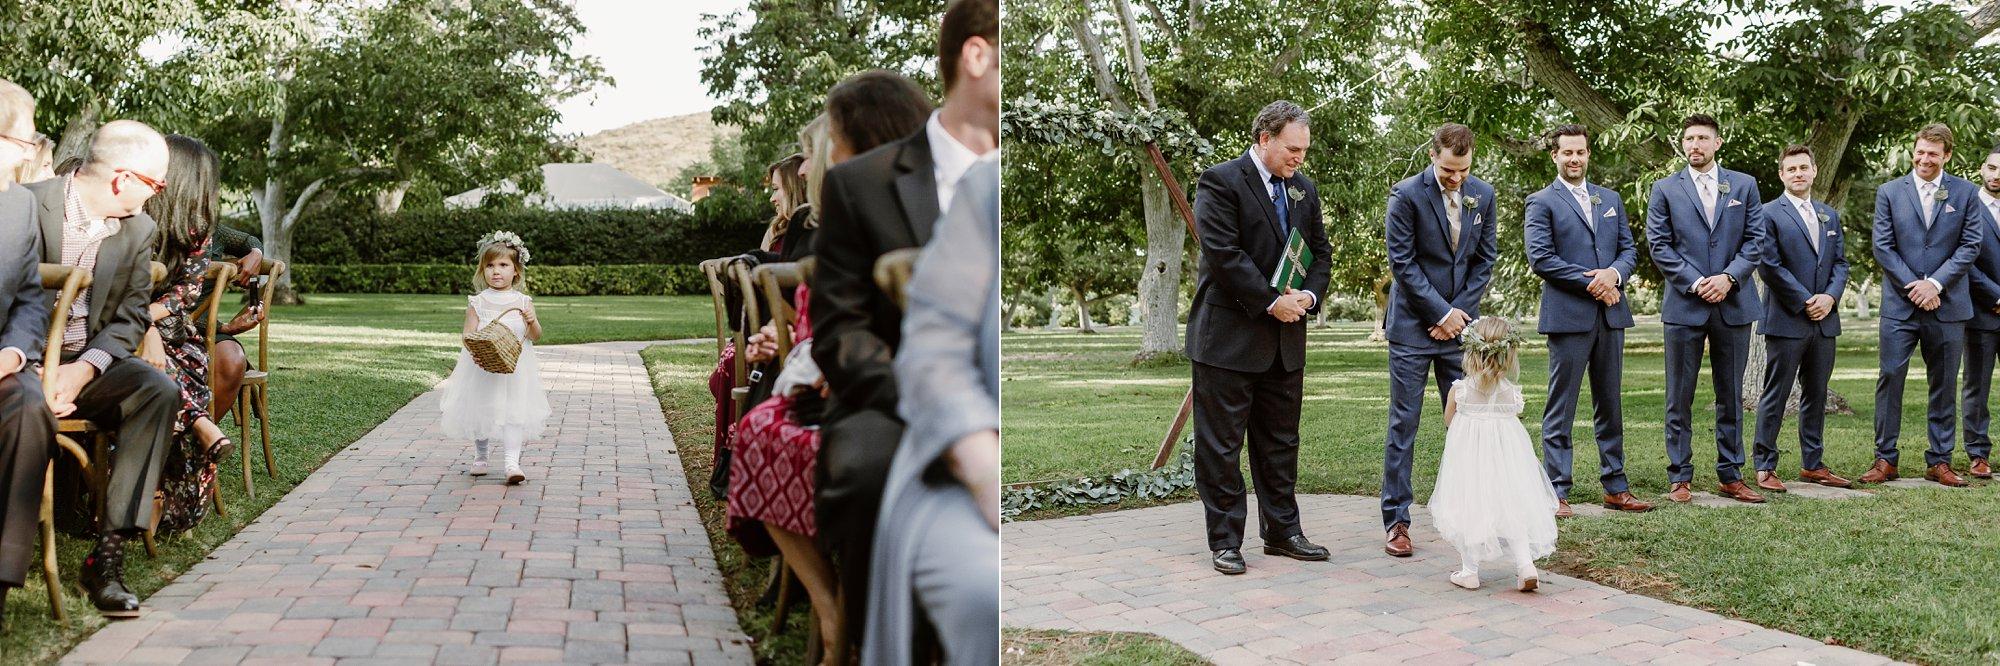 Walnut Grove Moorpark California Wedding_0019.jpg